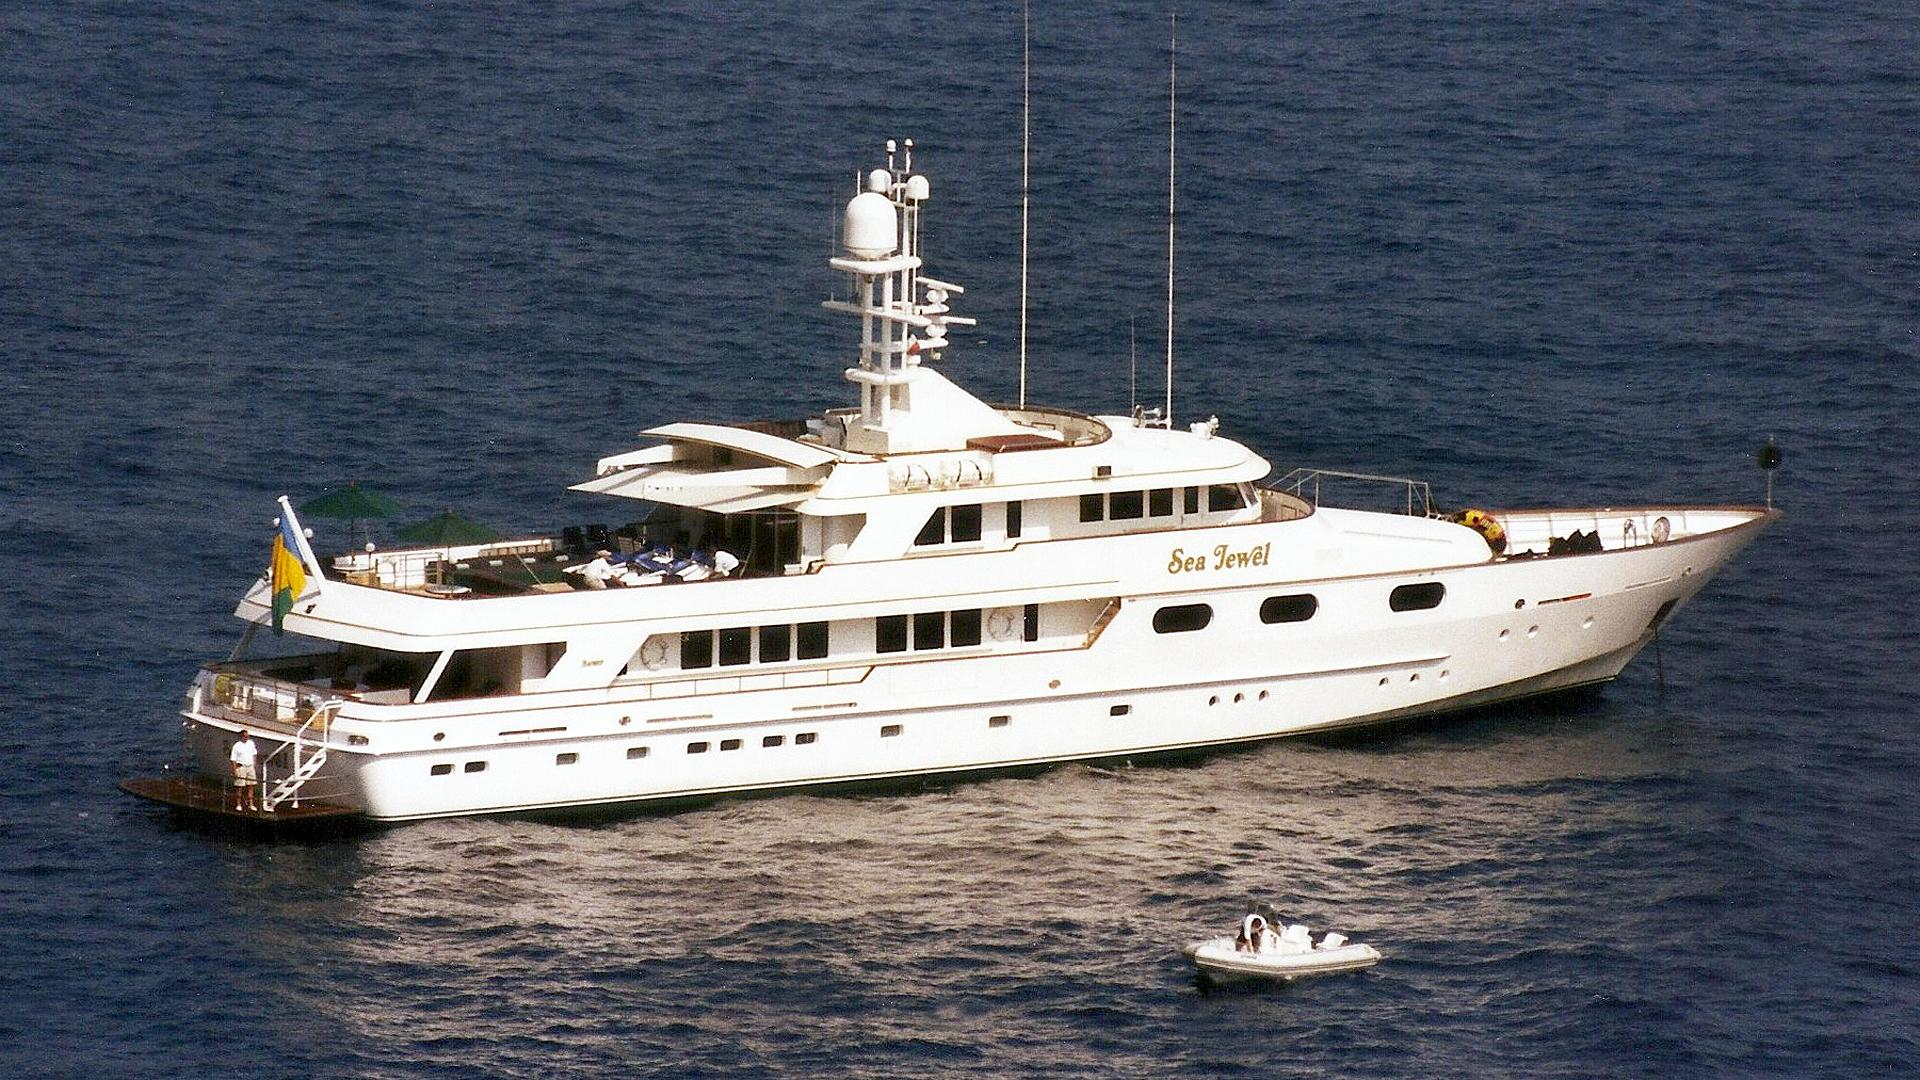 x-motor-yacht-feadship-1987-46m-profile